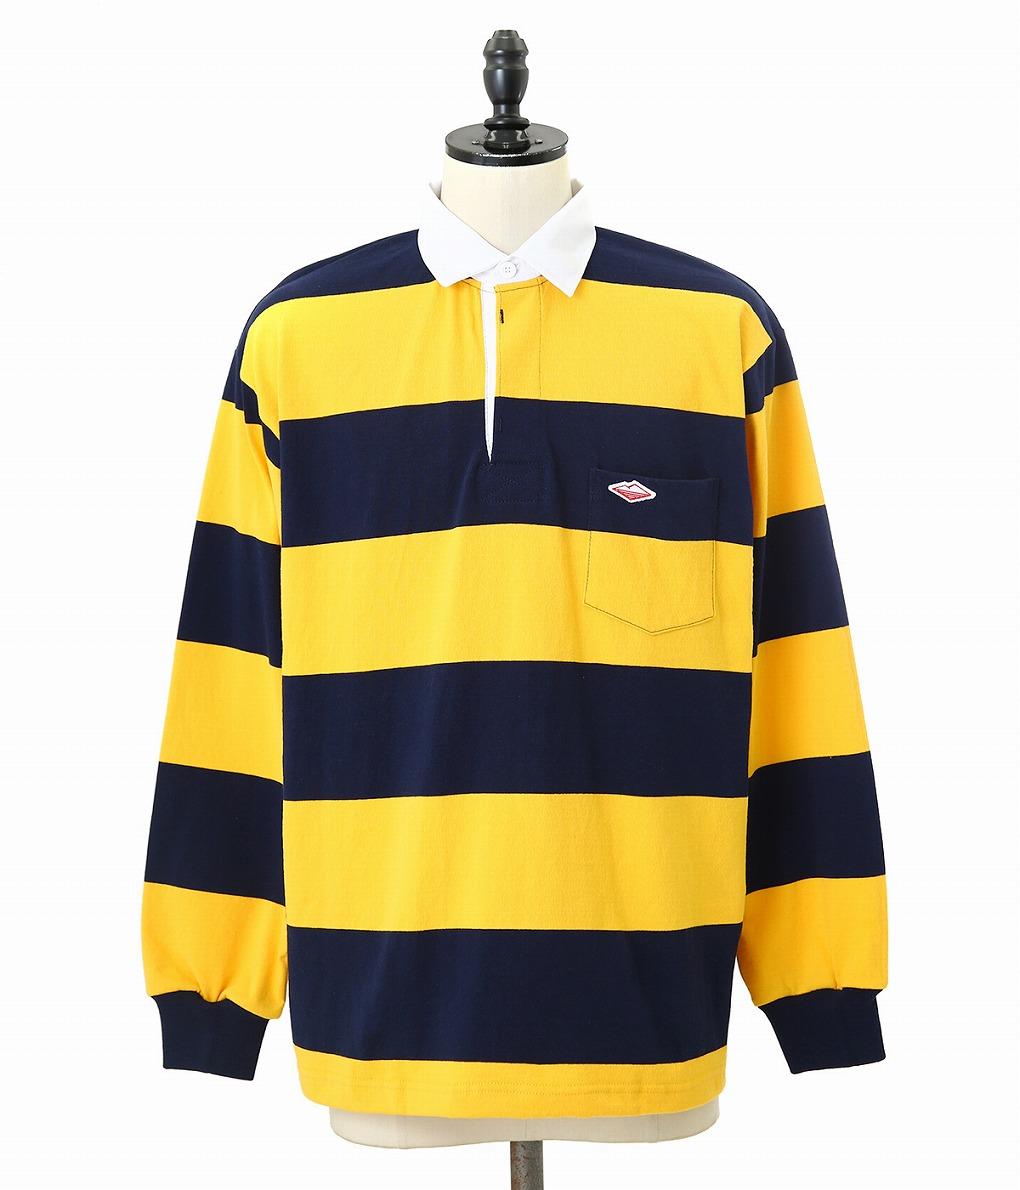 【SPECIAL PRICE!】Battenwear / バテンウェア : POCKET RUGBY SHIRT : ポケットラグビーシャツ ラグビーシャツ シャツ トップス 長袖 メンズ : SS19501A 【AST】